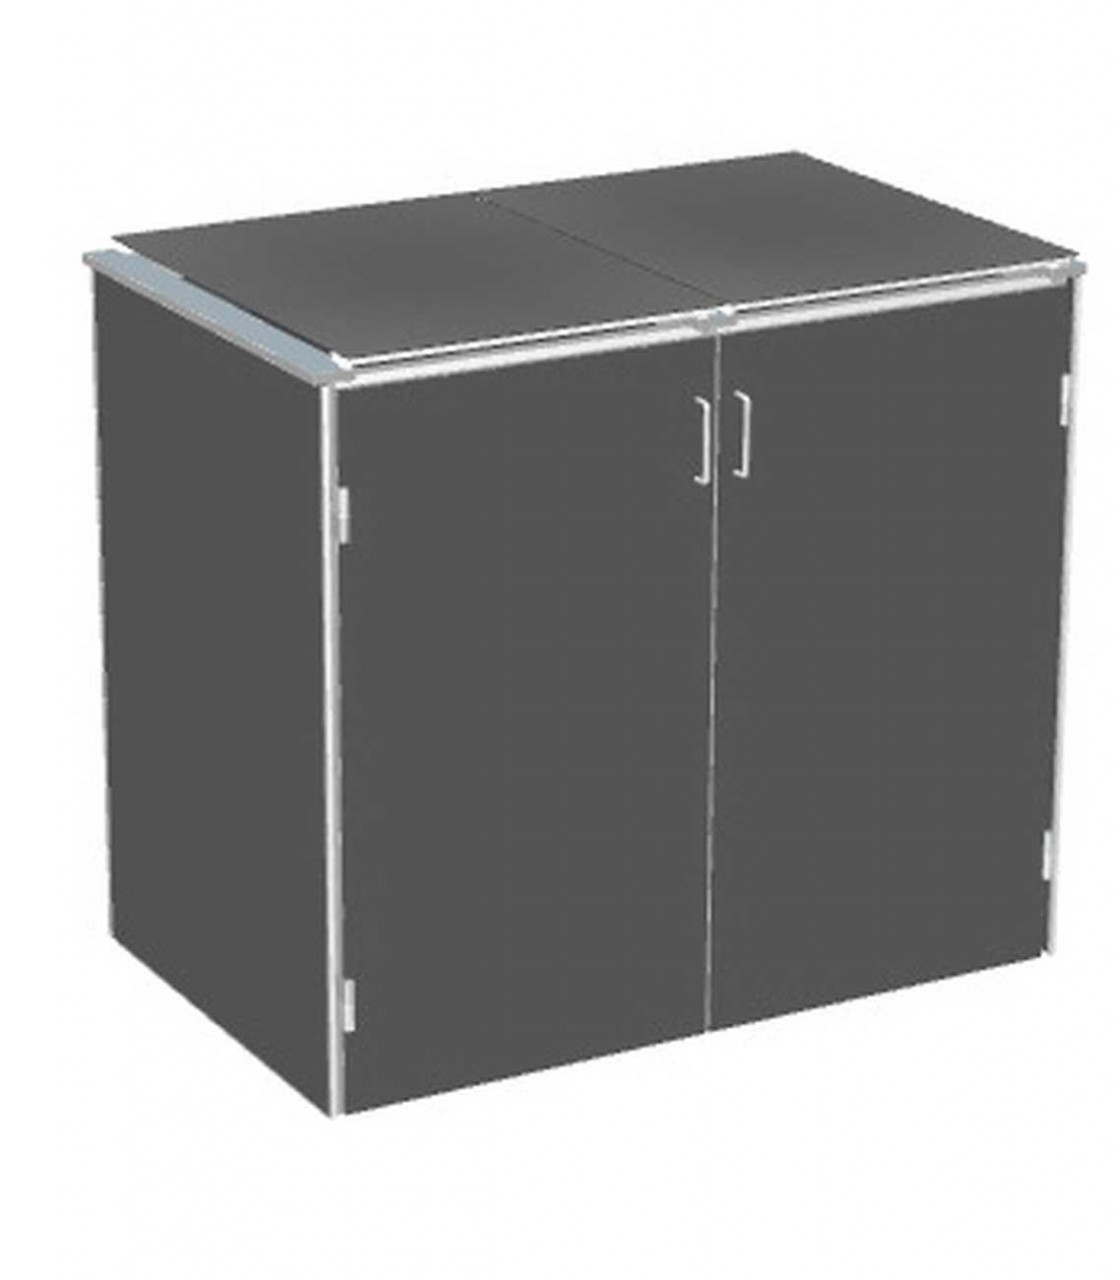 Binto Mülltonnenbox HPL Schiefer mit HPL Klappdeckel